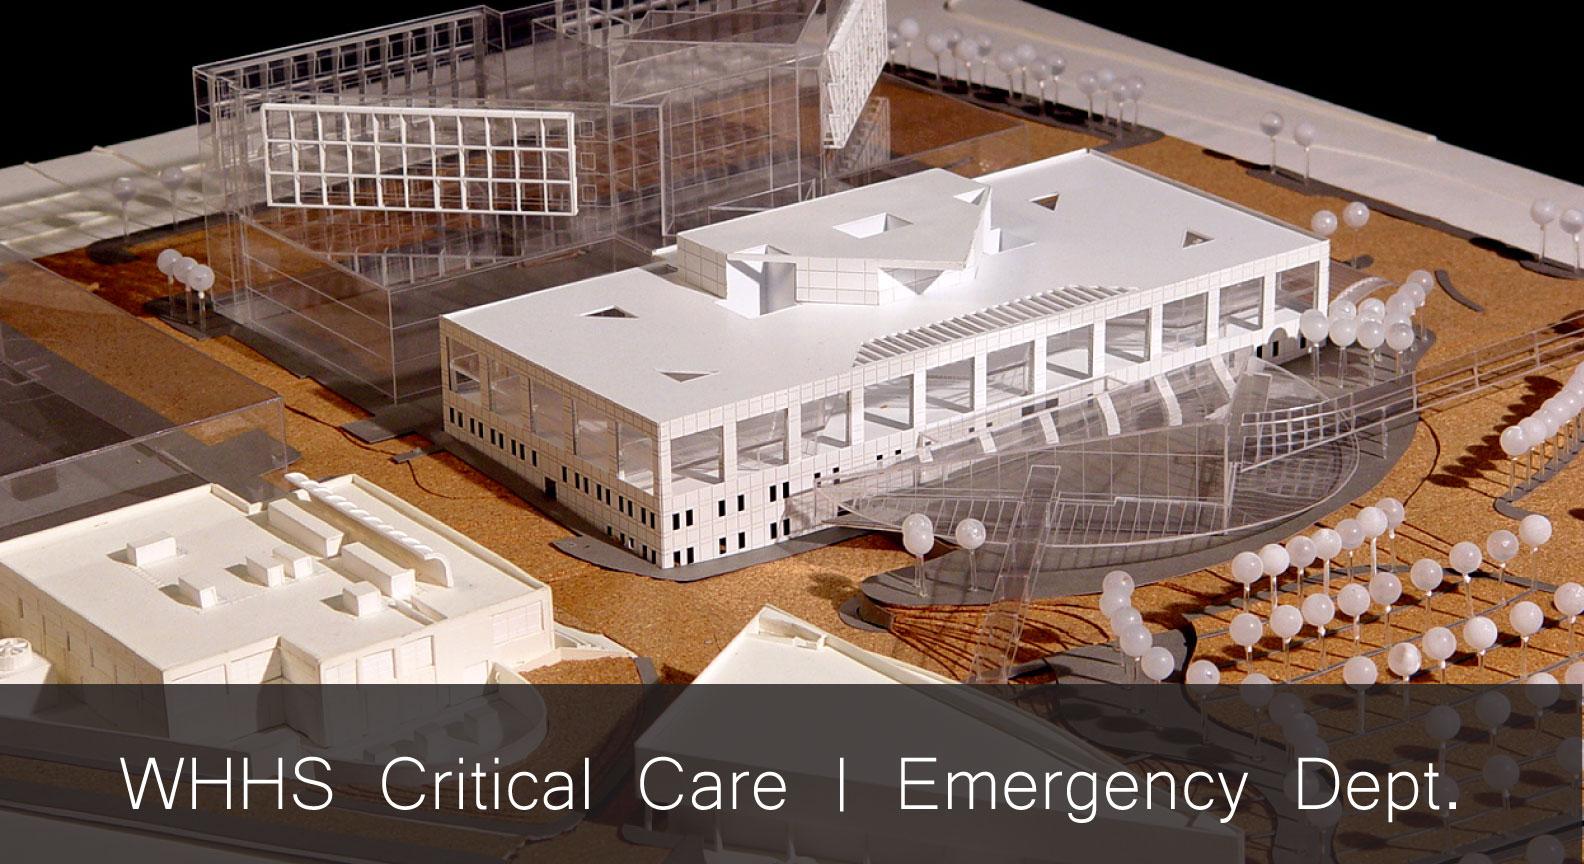 FCA-WHHS-Critical-Care,-Emergency-Dept..jpg